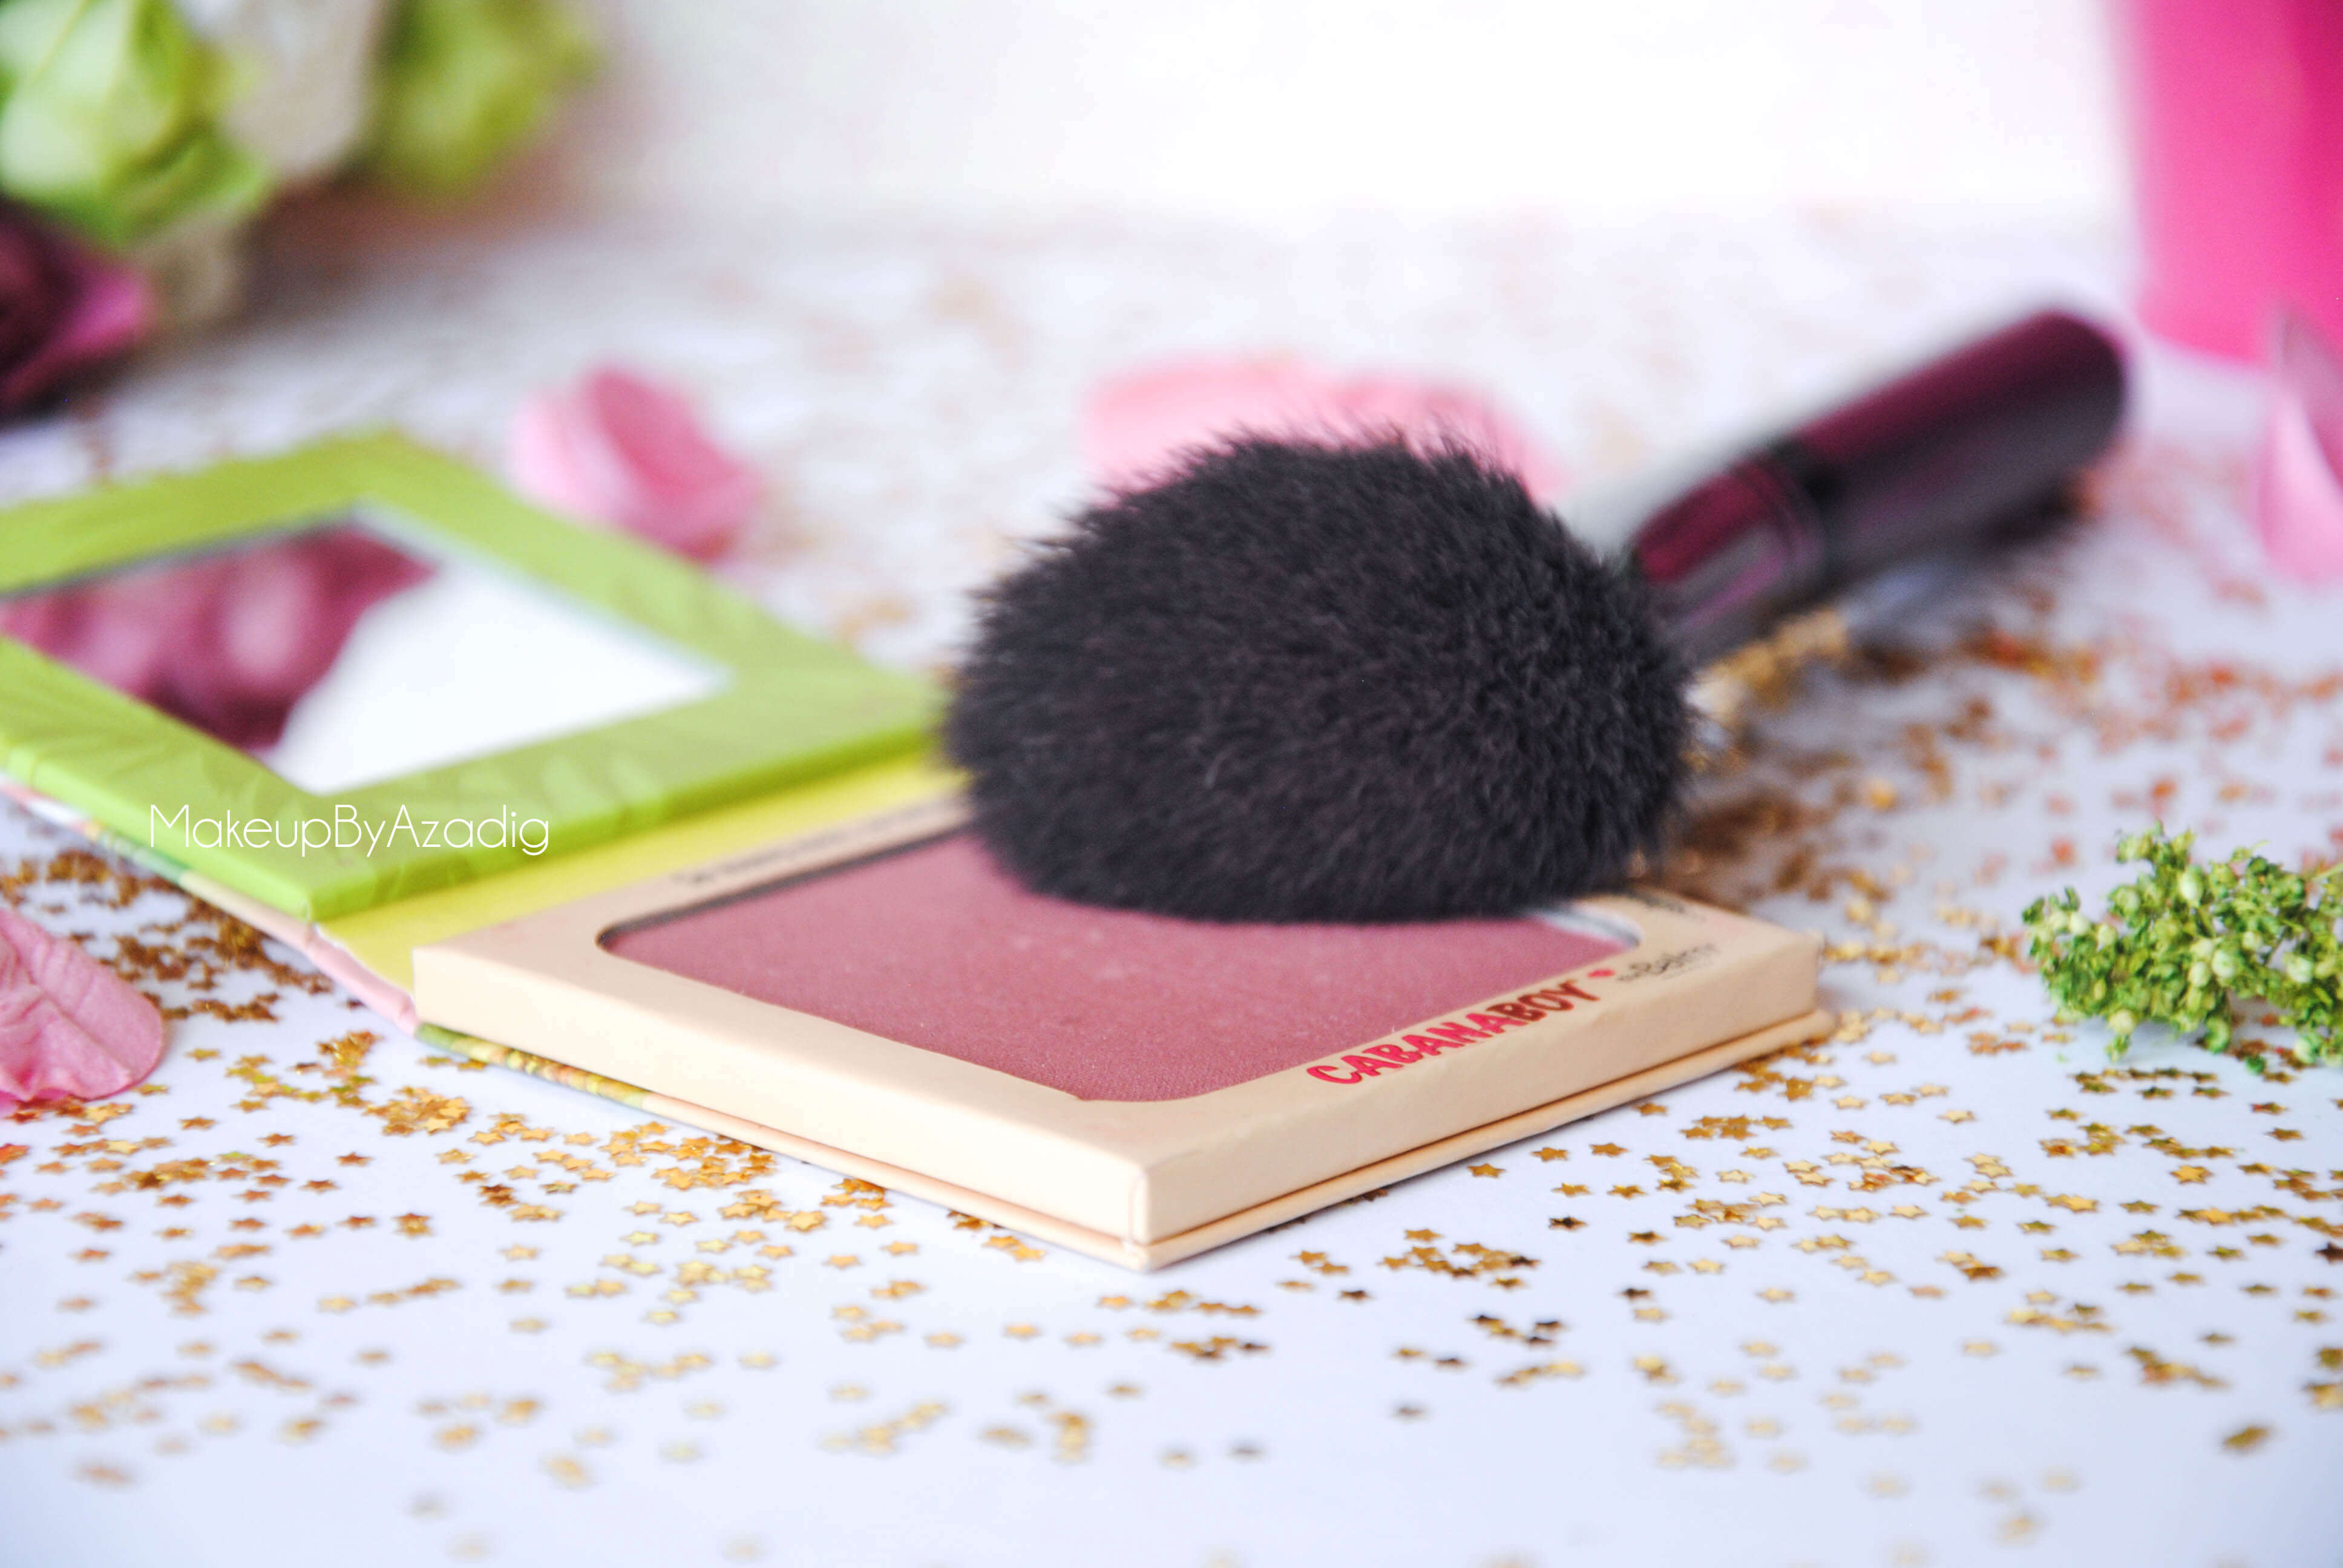 cabanaboy-the balm-blush rose fonce-monoprix-beaute privee-the beautyst-makeupbyazadig-poudre